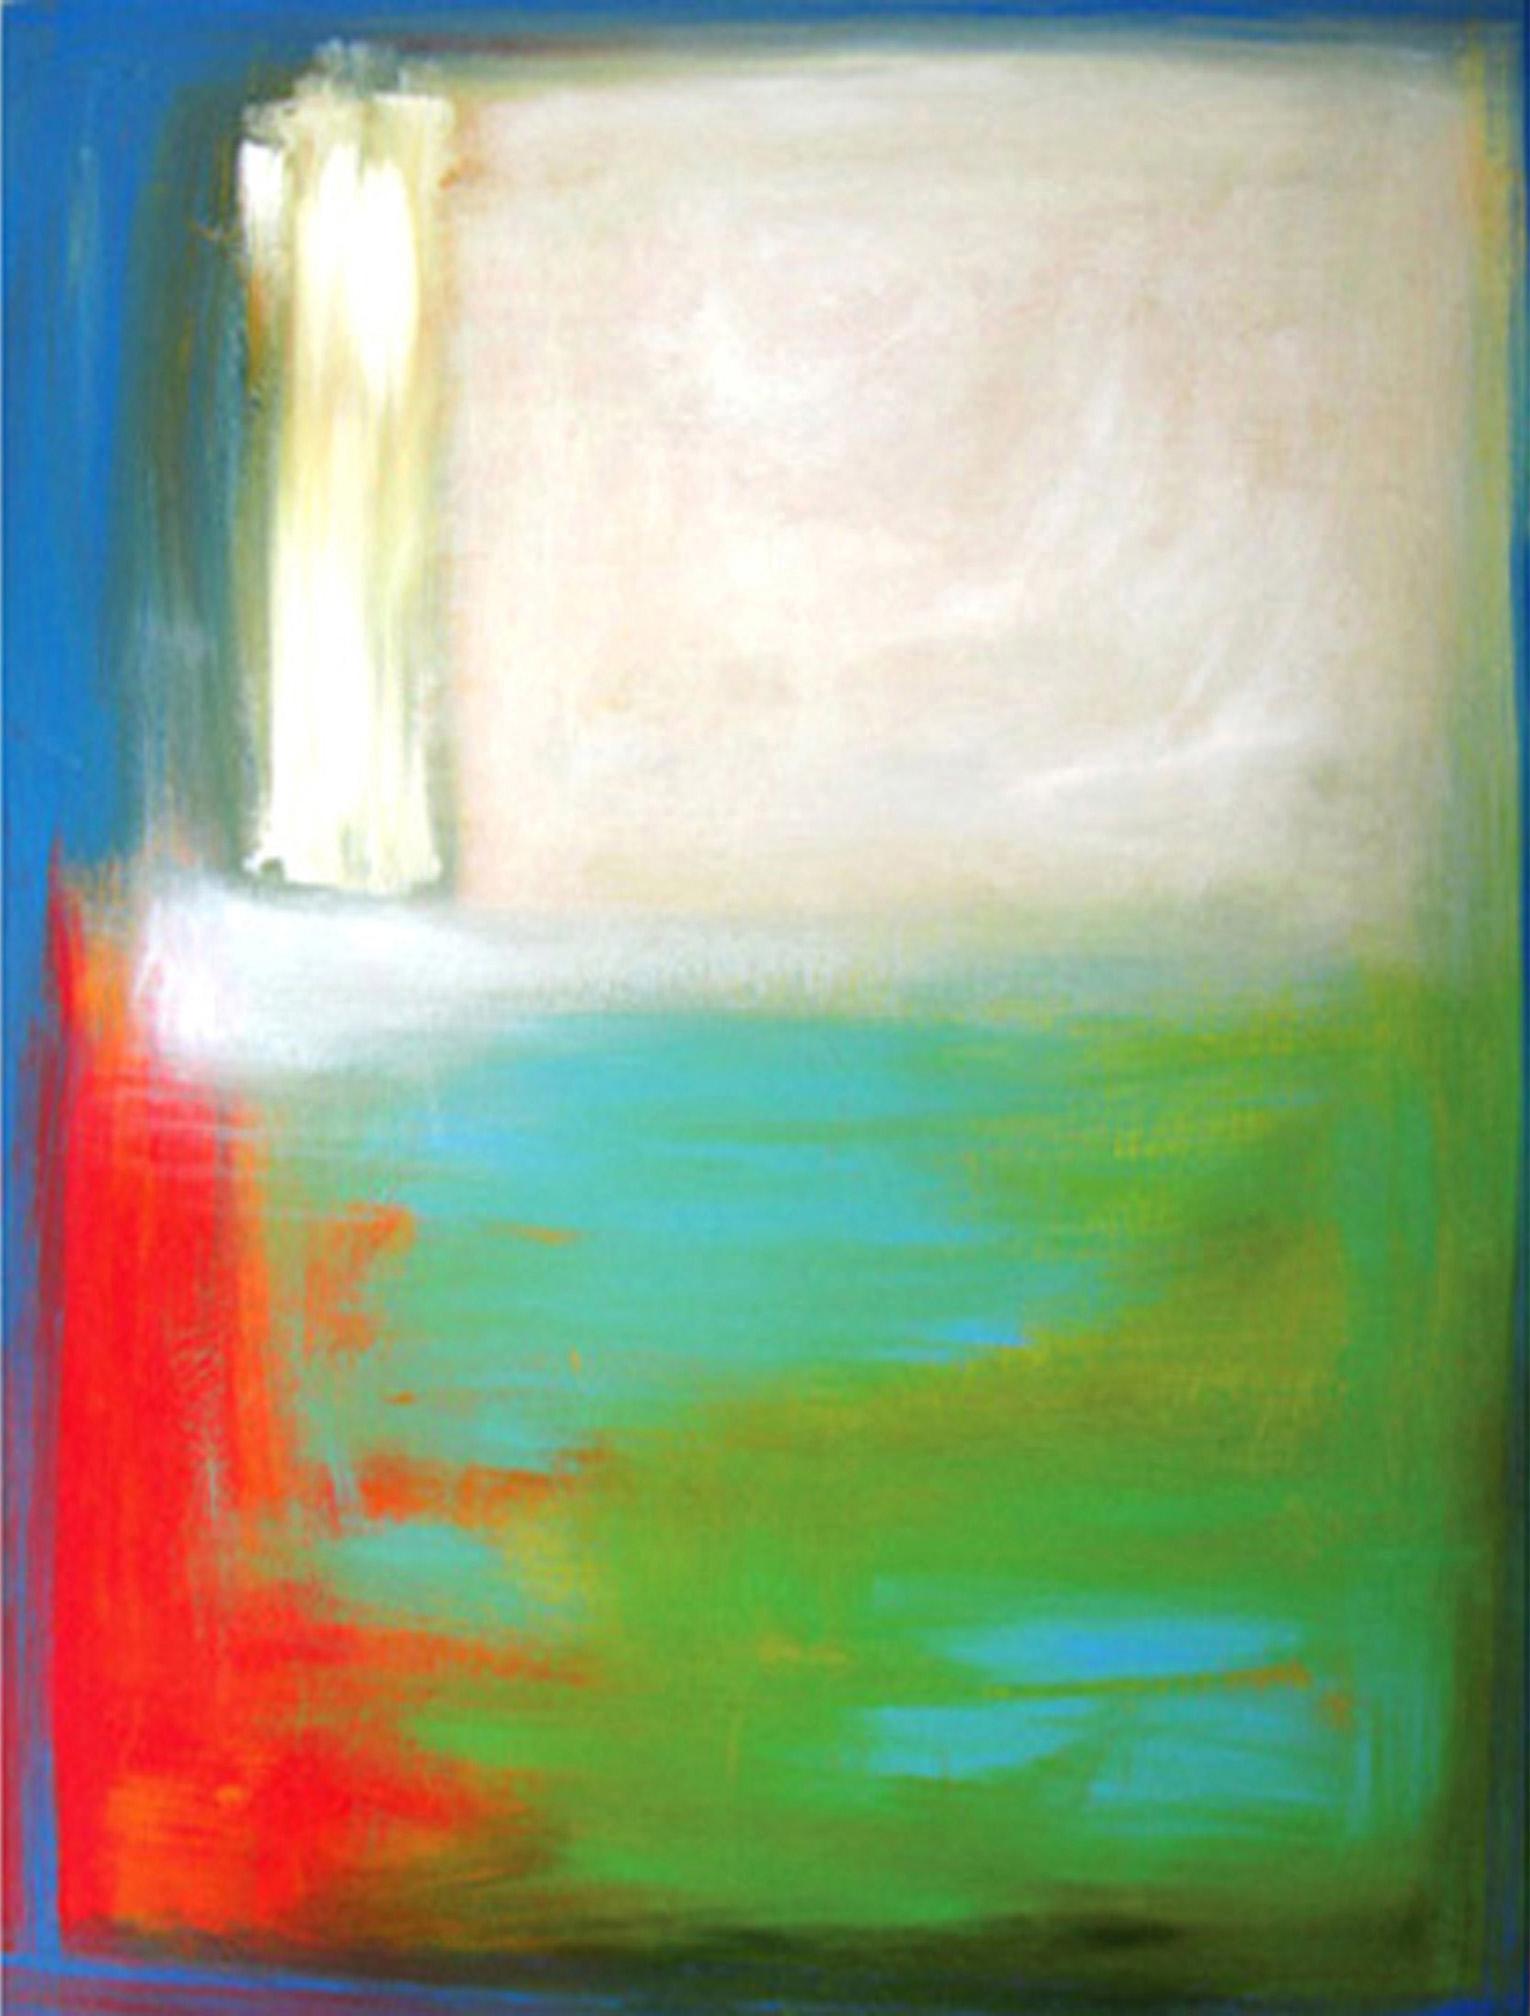 Amorsinlimites by Tania Alcala